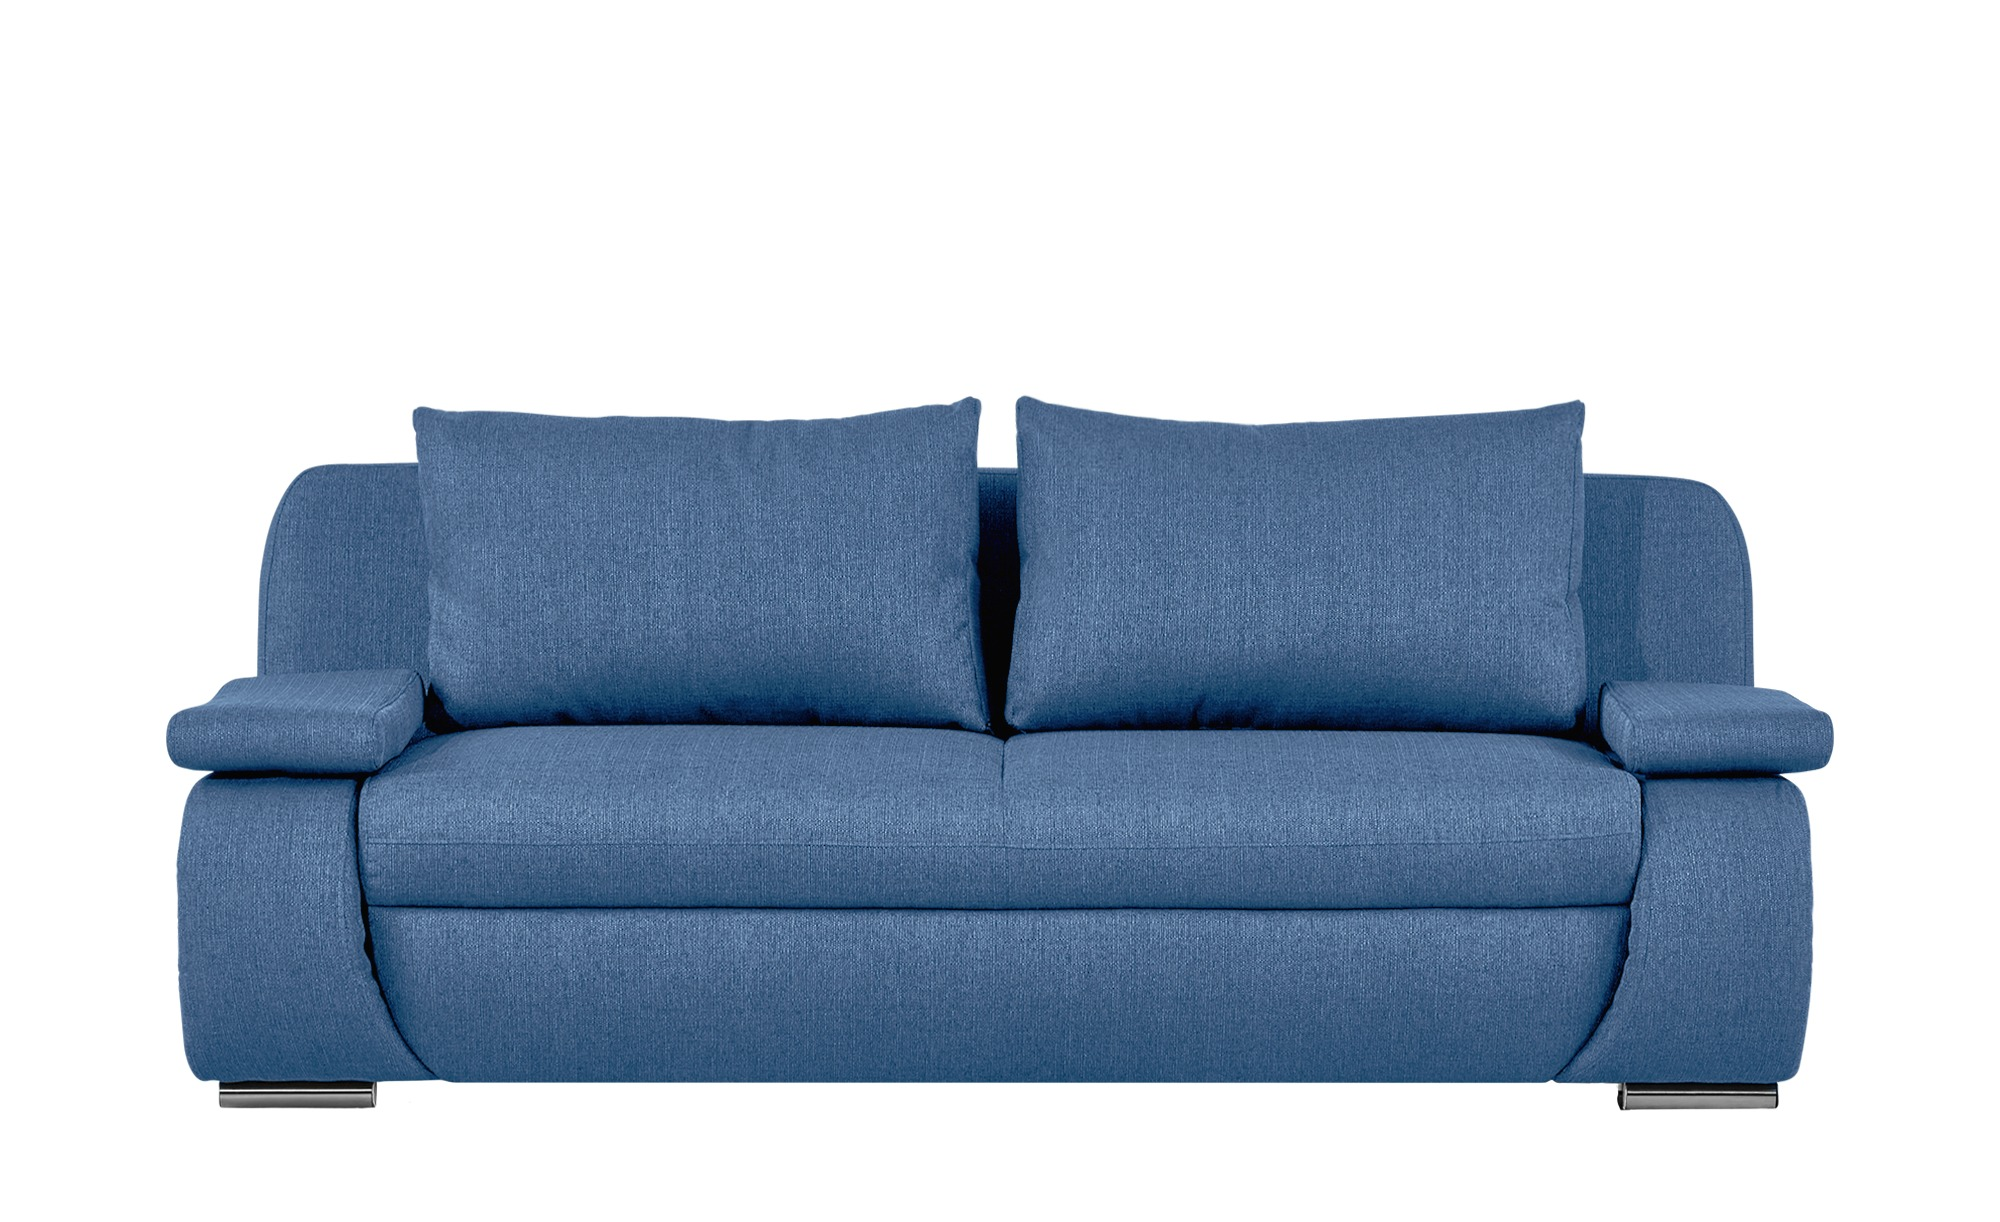 smart Schlafsofa  blau - Webstoff Bonita ¦ blau ¦ Maße (cm): B: 210 H: 87 T: 100 Polstermöbel > Sofas > 2-Sitzer - Höffner